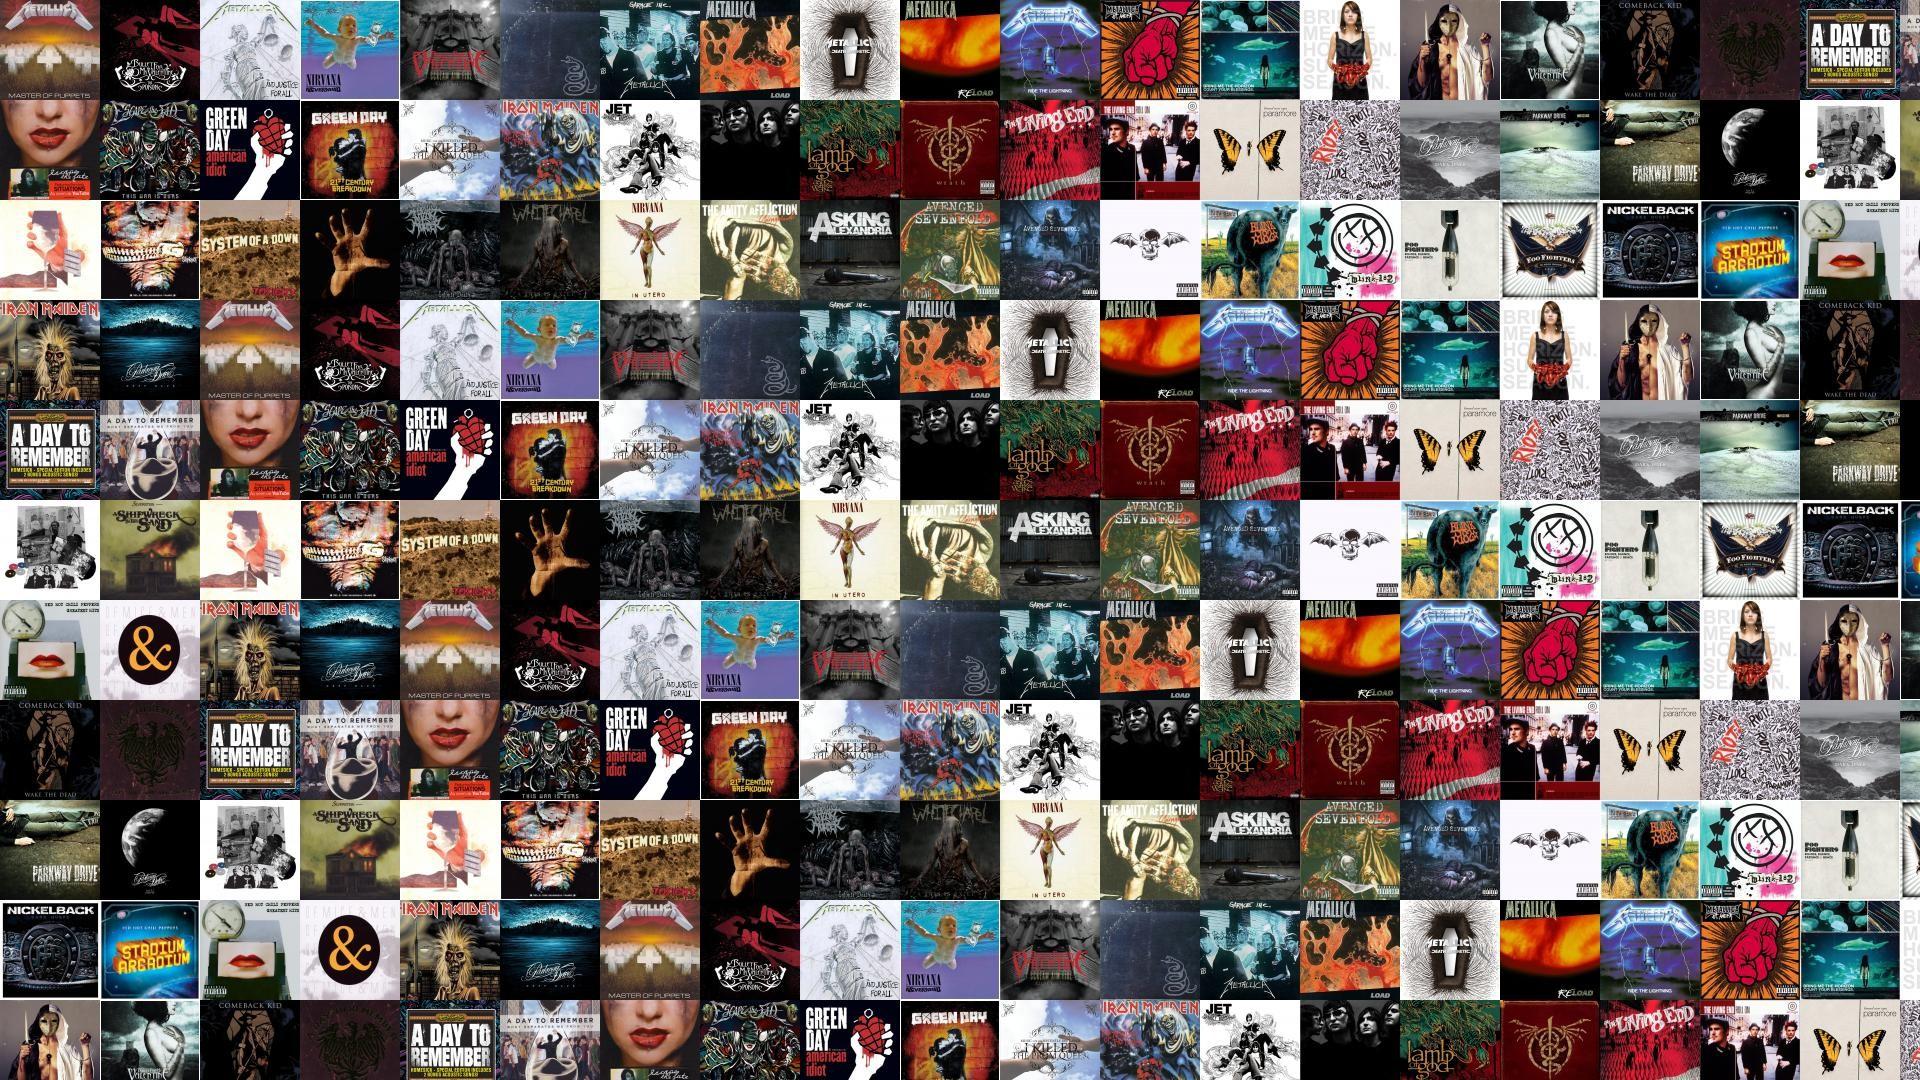 Metallica Master Puppets Bullet For My Valentine Poison Wallpaper Â« Tiled  Desktop Wallpaper